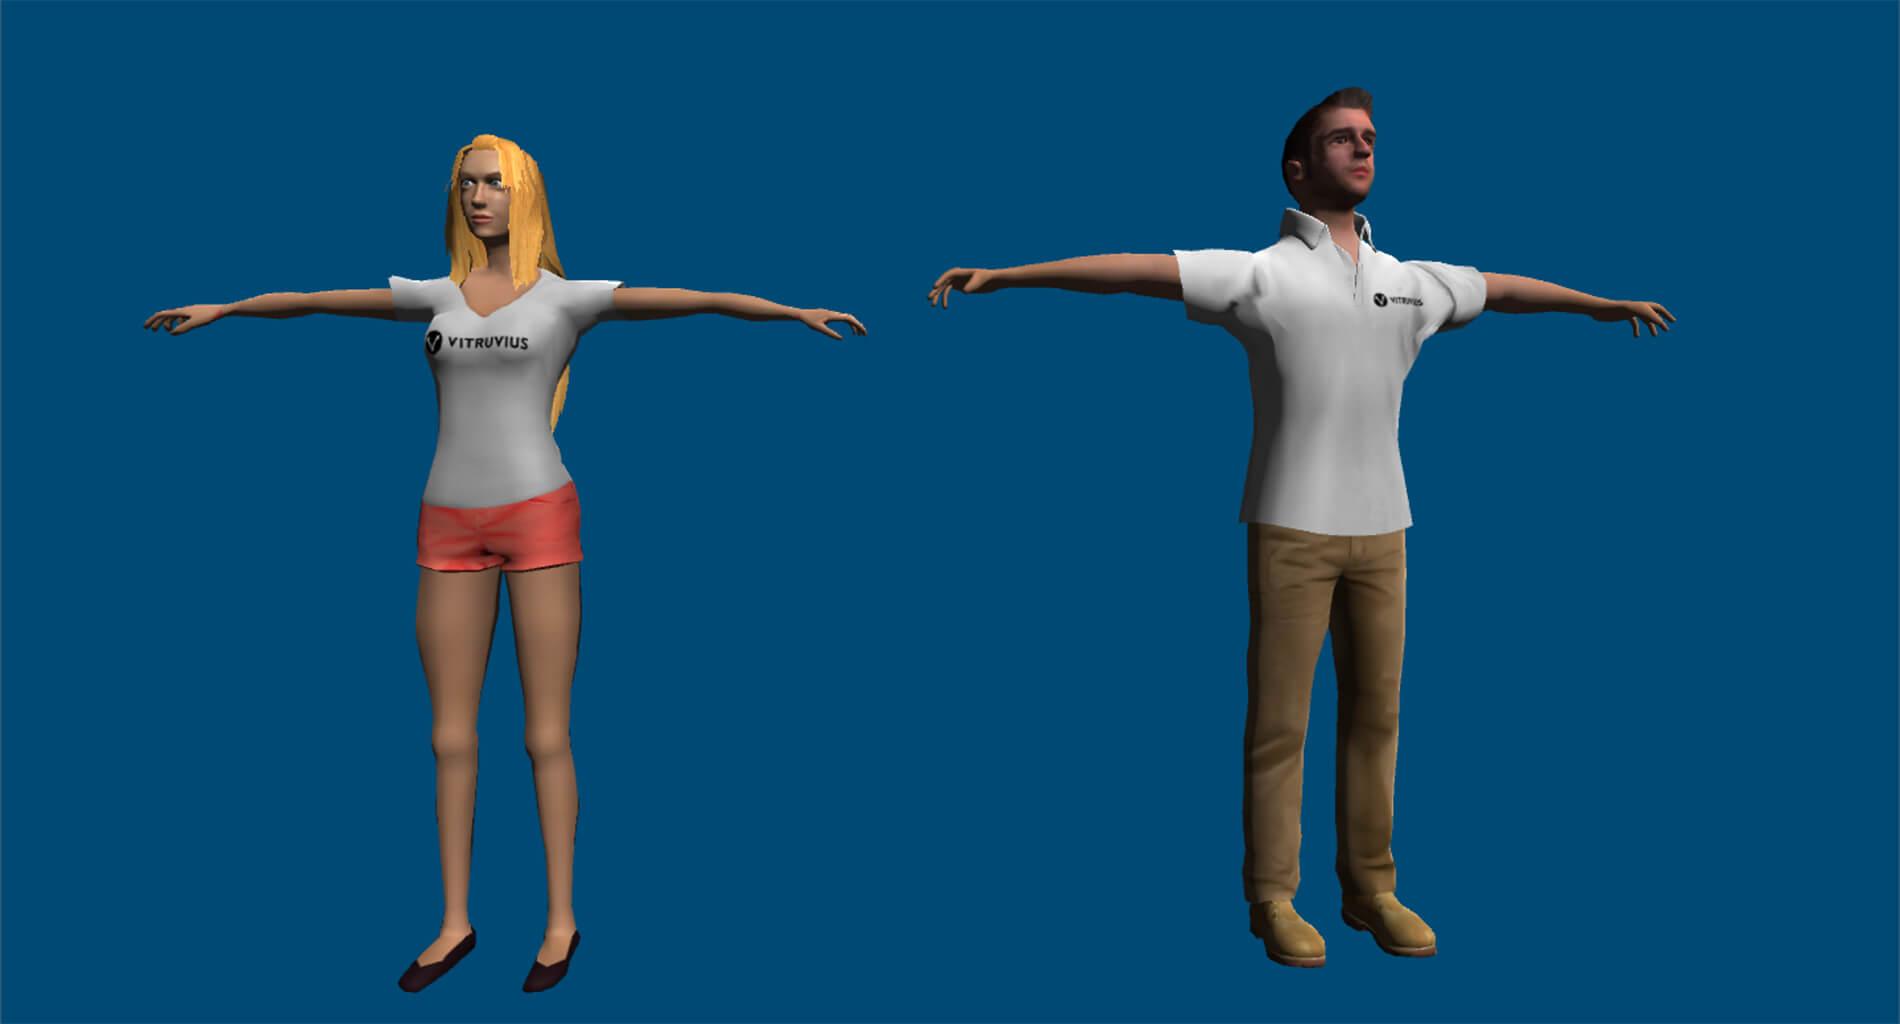 Avateering (Kinect + Unity) | Vitruvius